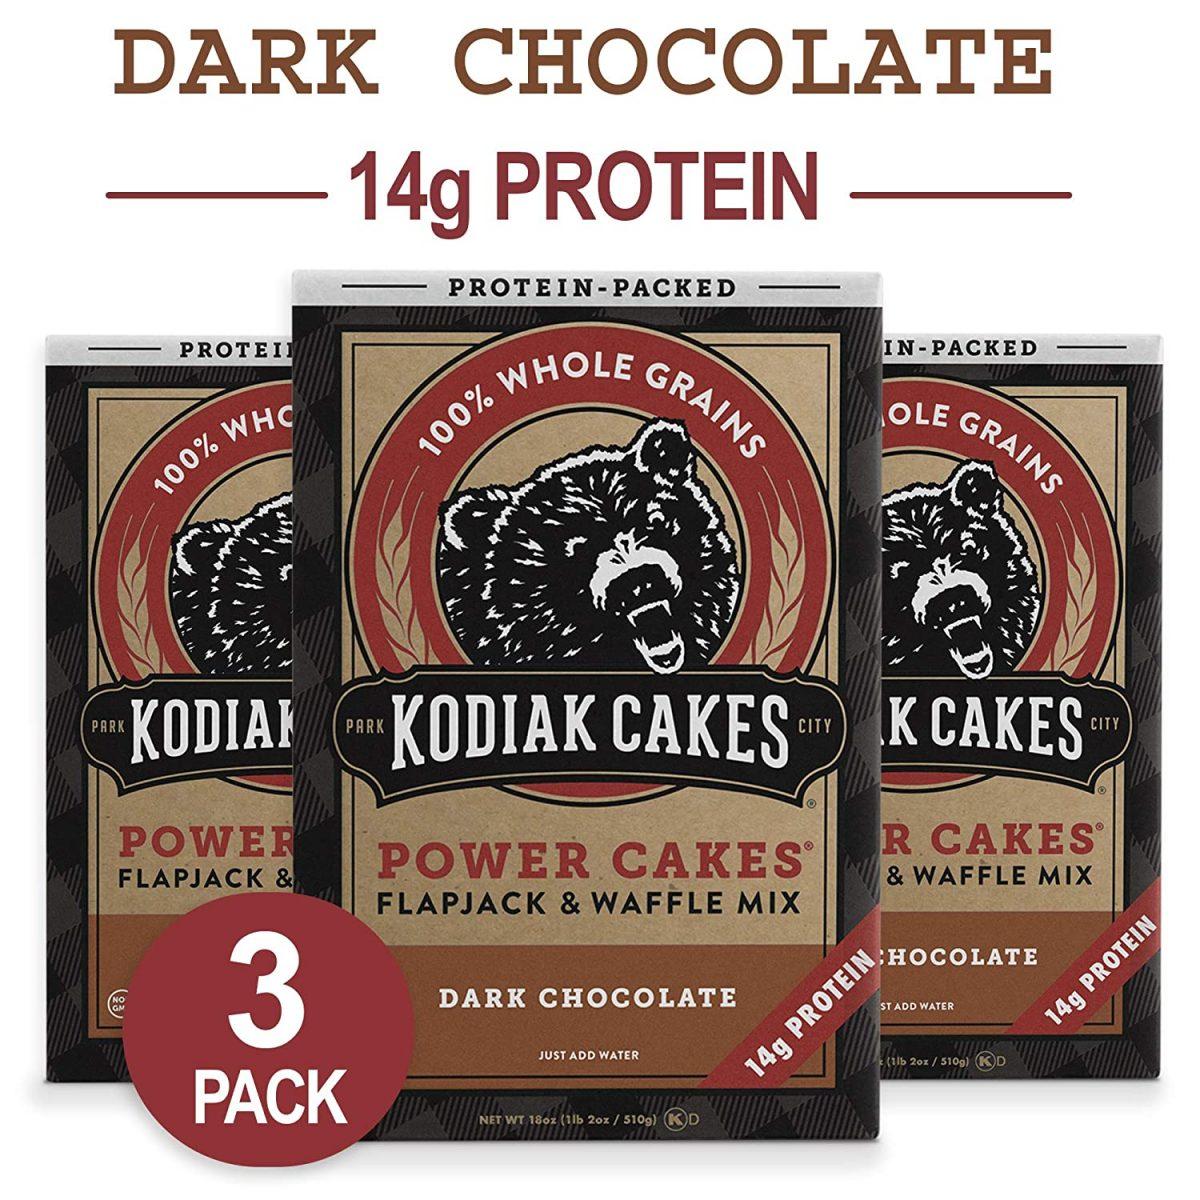 Kodiak Cakes Protein Pancake Power Cakes, Flapjack and Waffle Baking Mix, Dark Chocolate